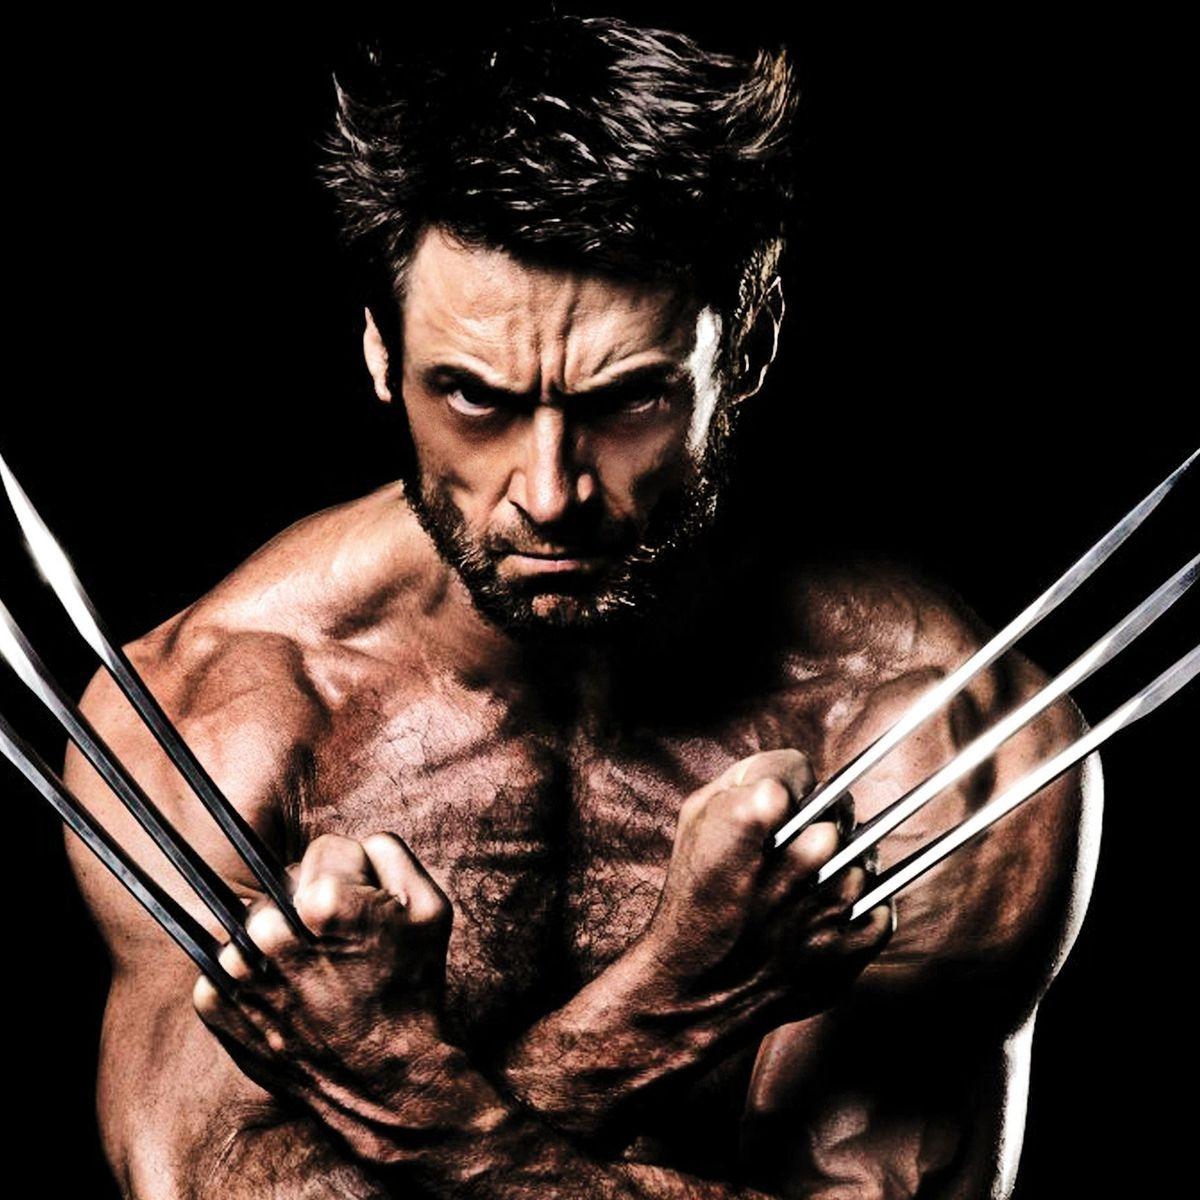 Hugh-Jackman-Wolverine_0.jpg